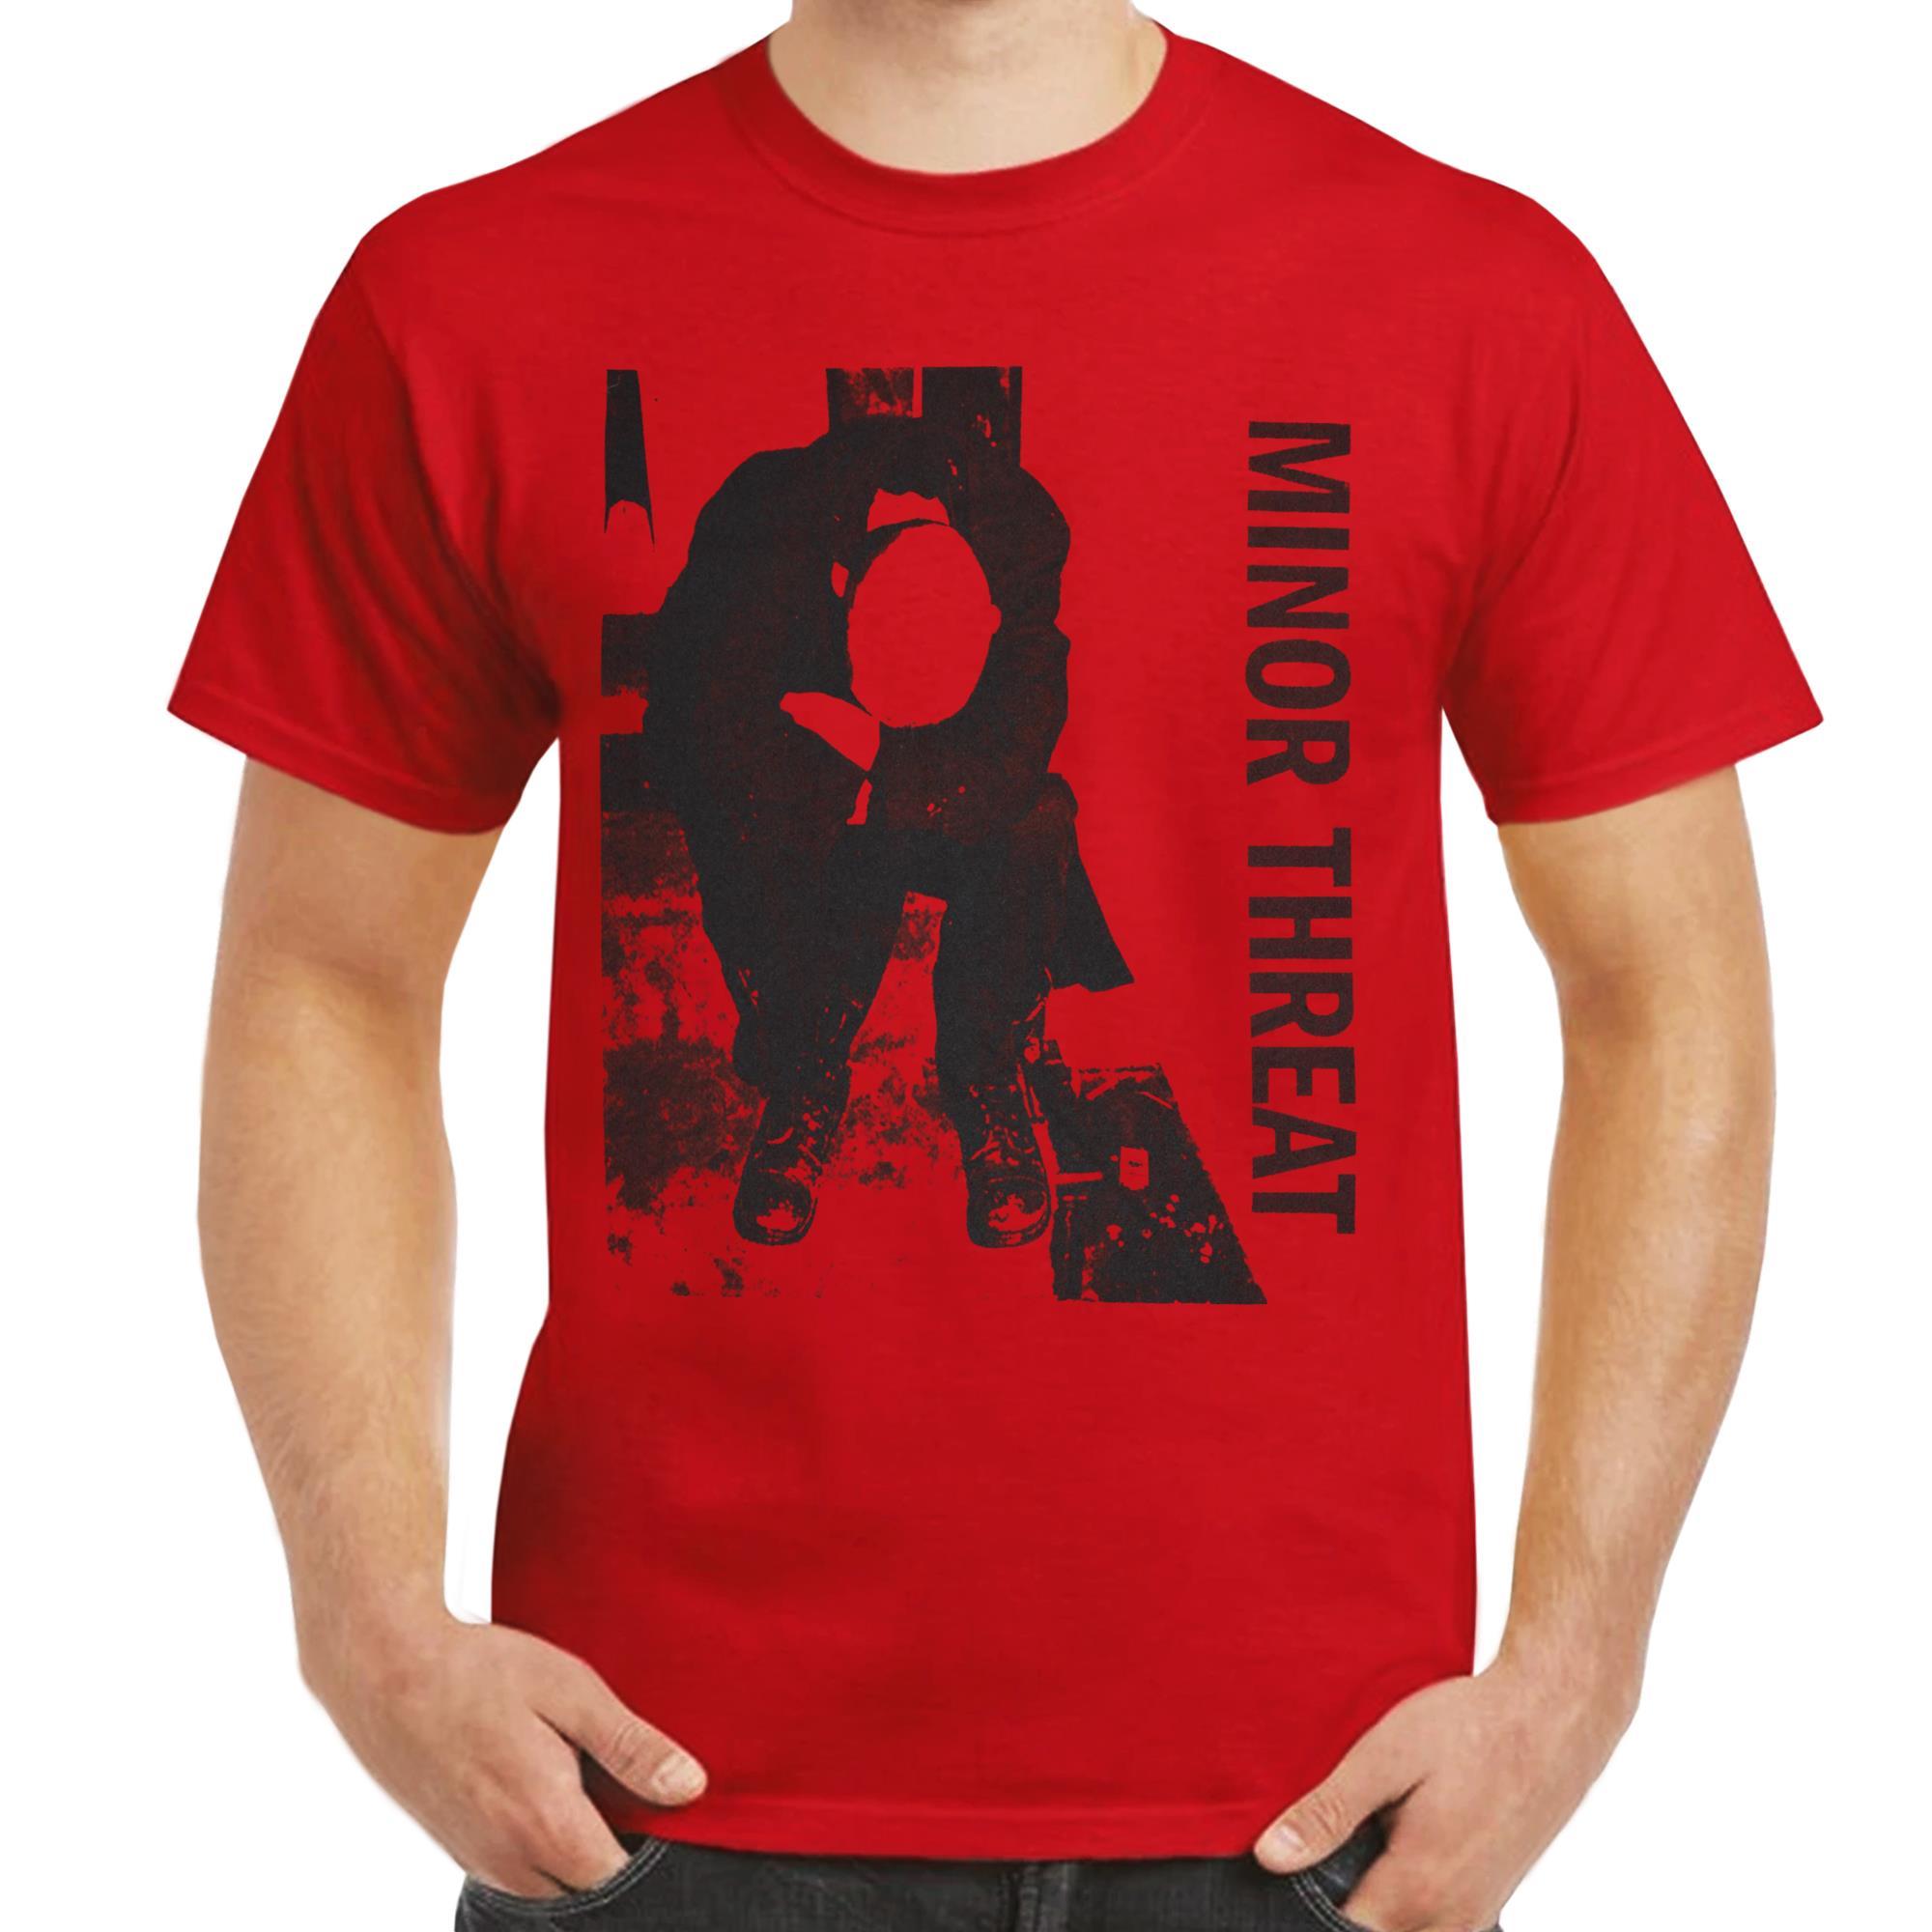 Minor Threat LP T-shirt